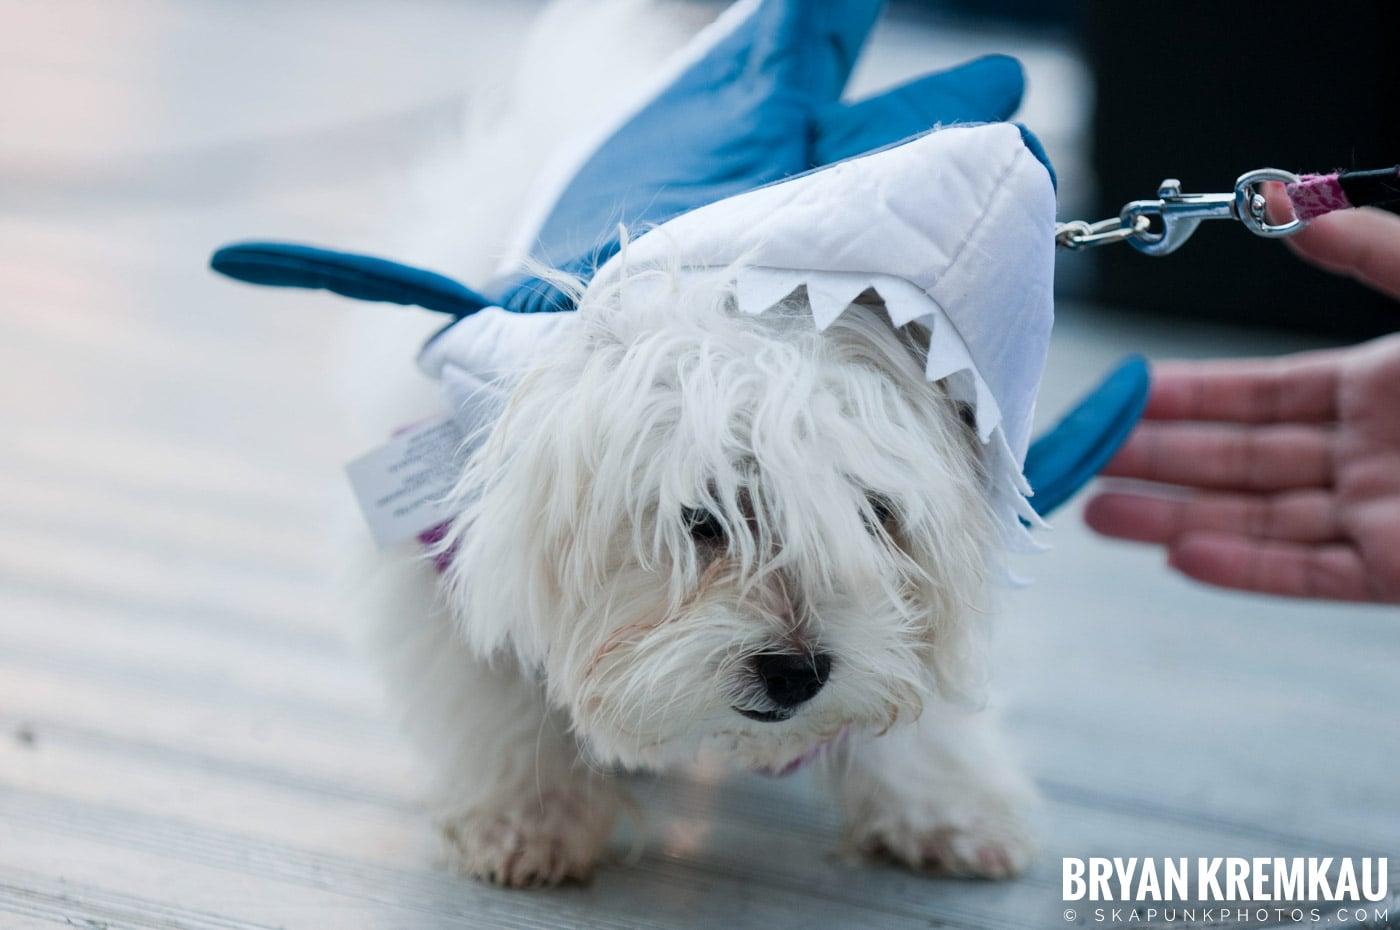 Paulus Hook Halloween Pet Parade 2011 @ Jersey City, NJ - 10.30.11 (16)